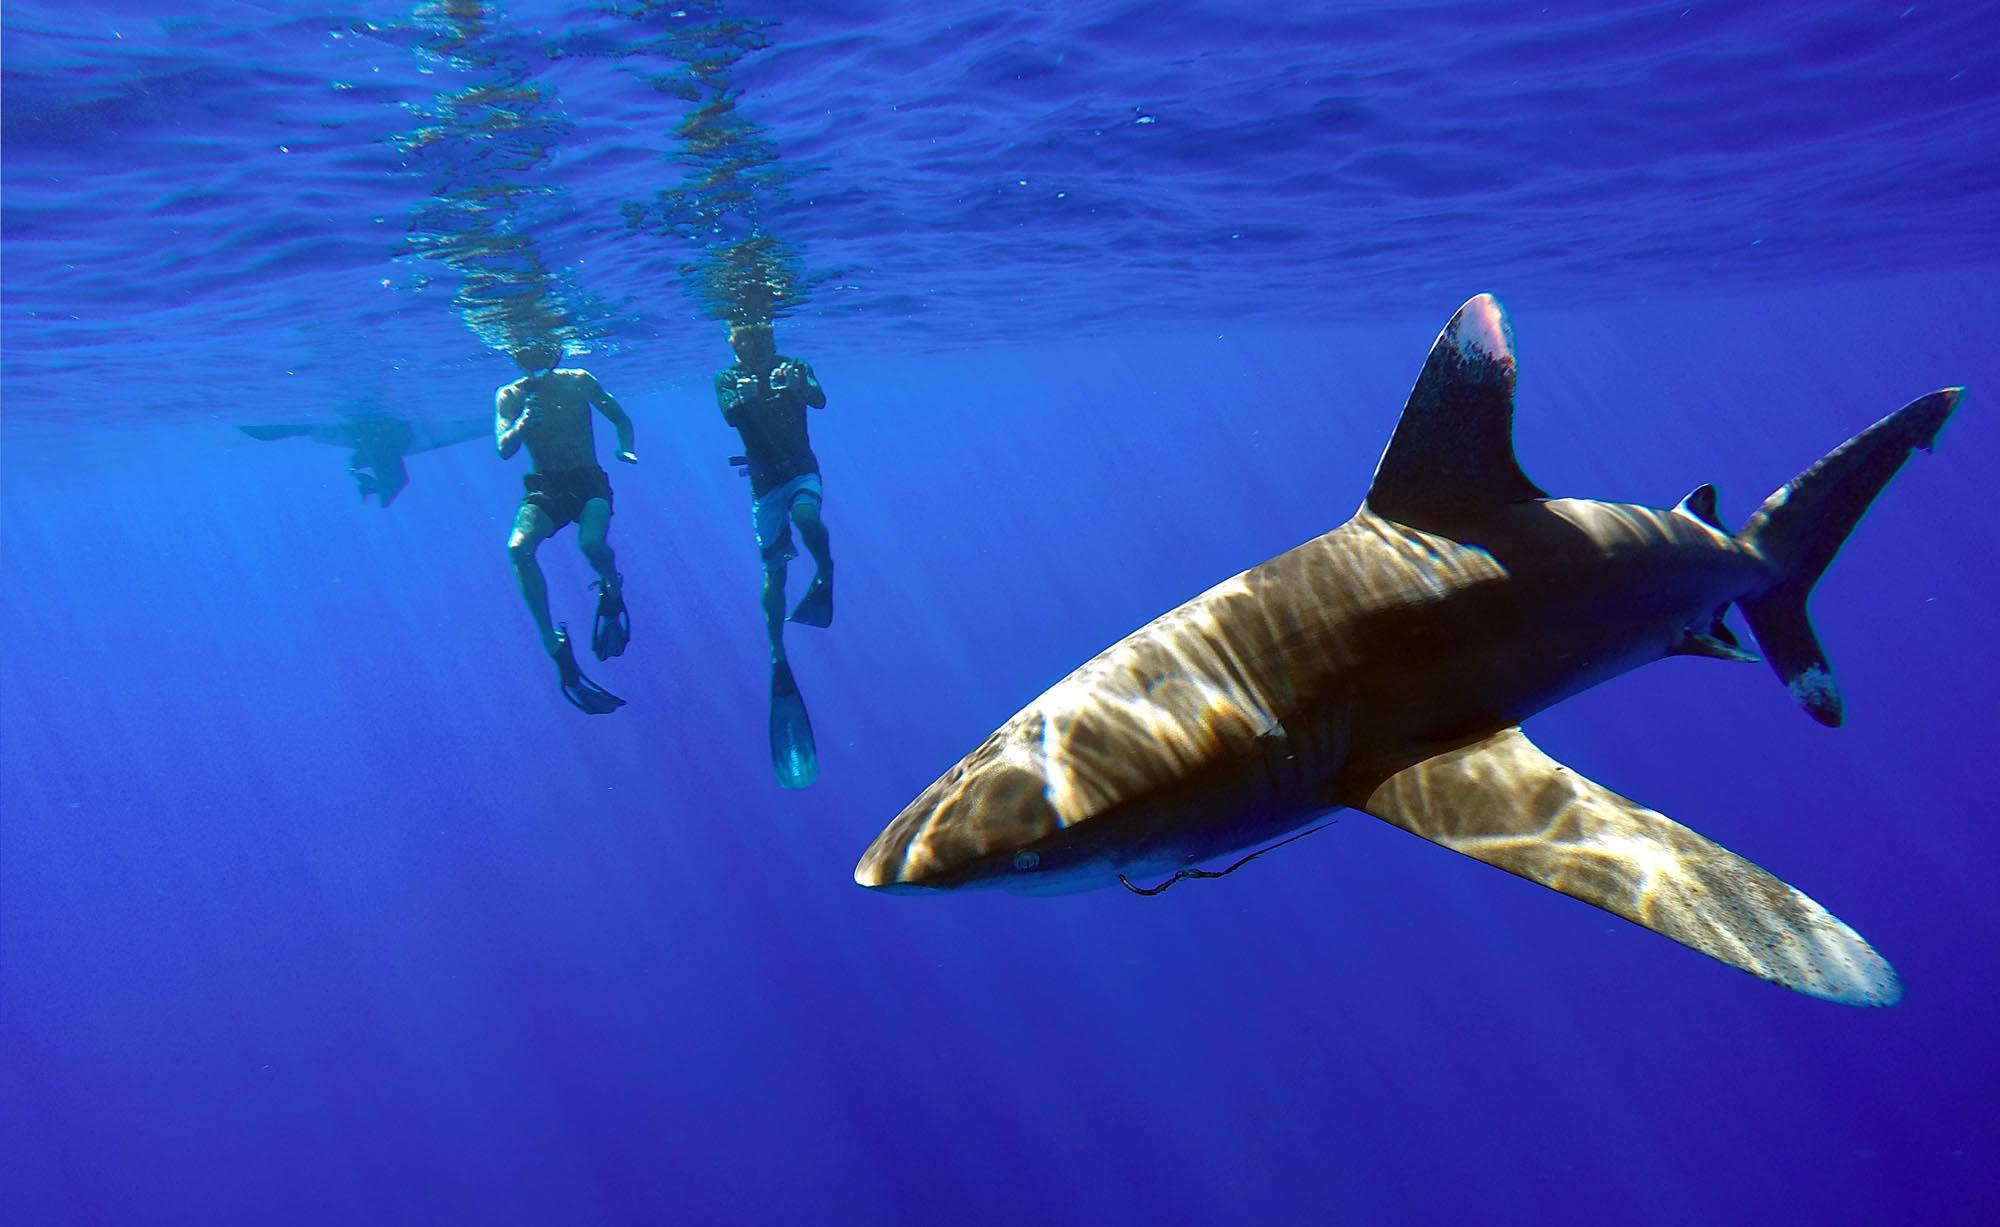 Open water snorkeling bird watching sharks dolphins pelagic private boat tours moorea ocean adventures